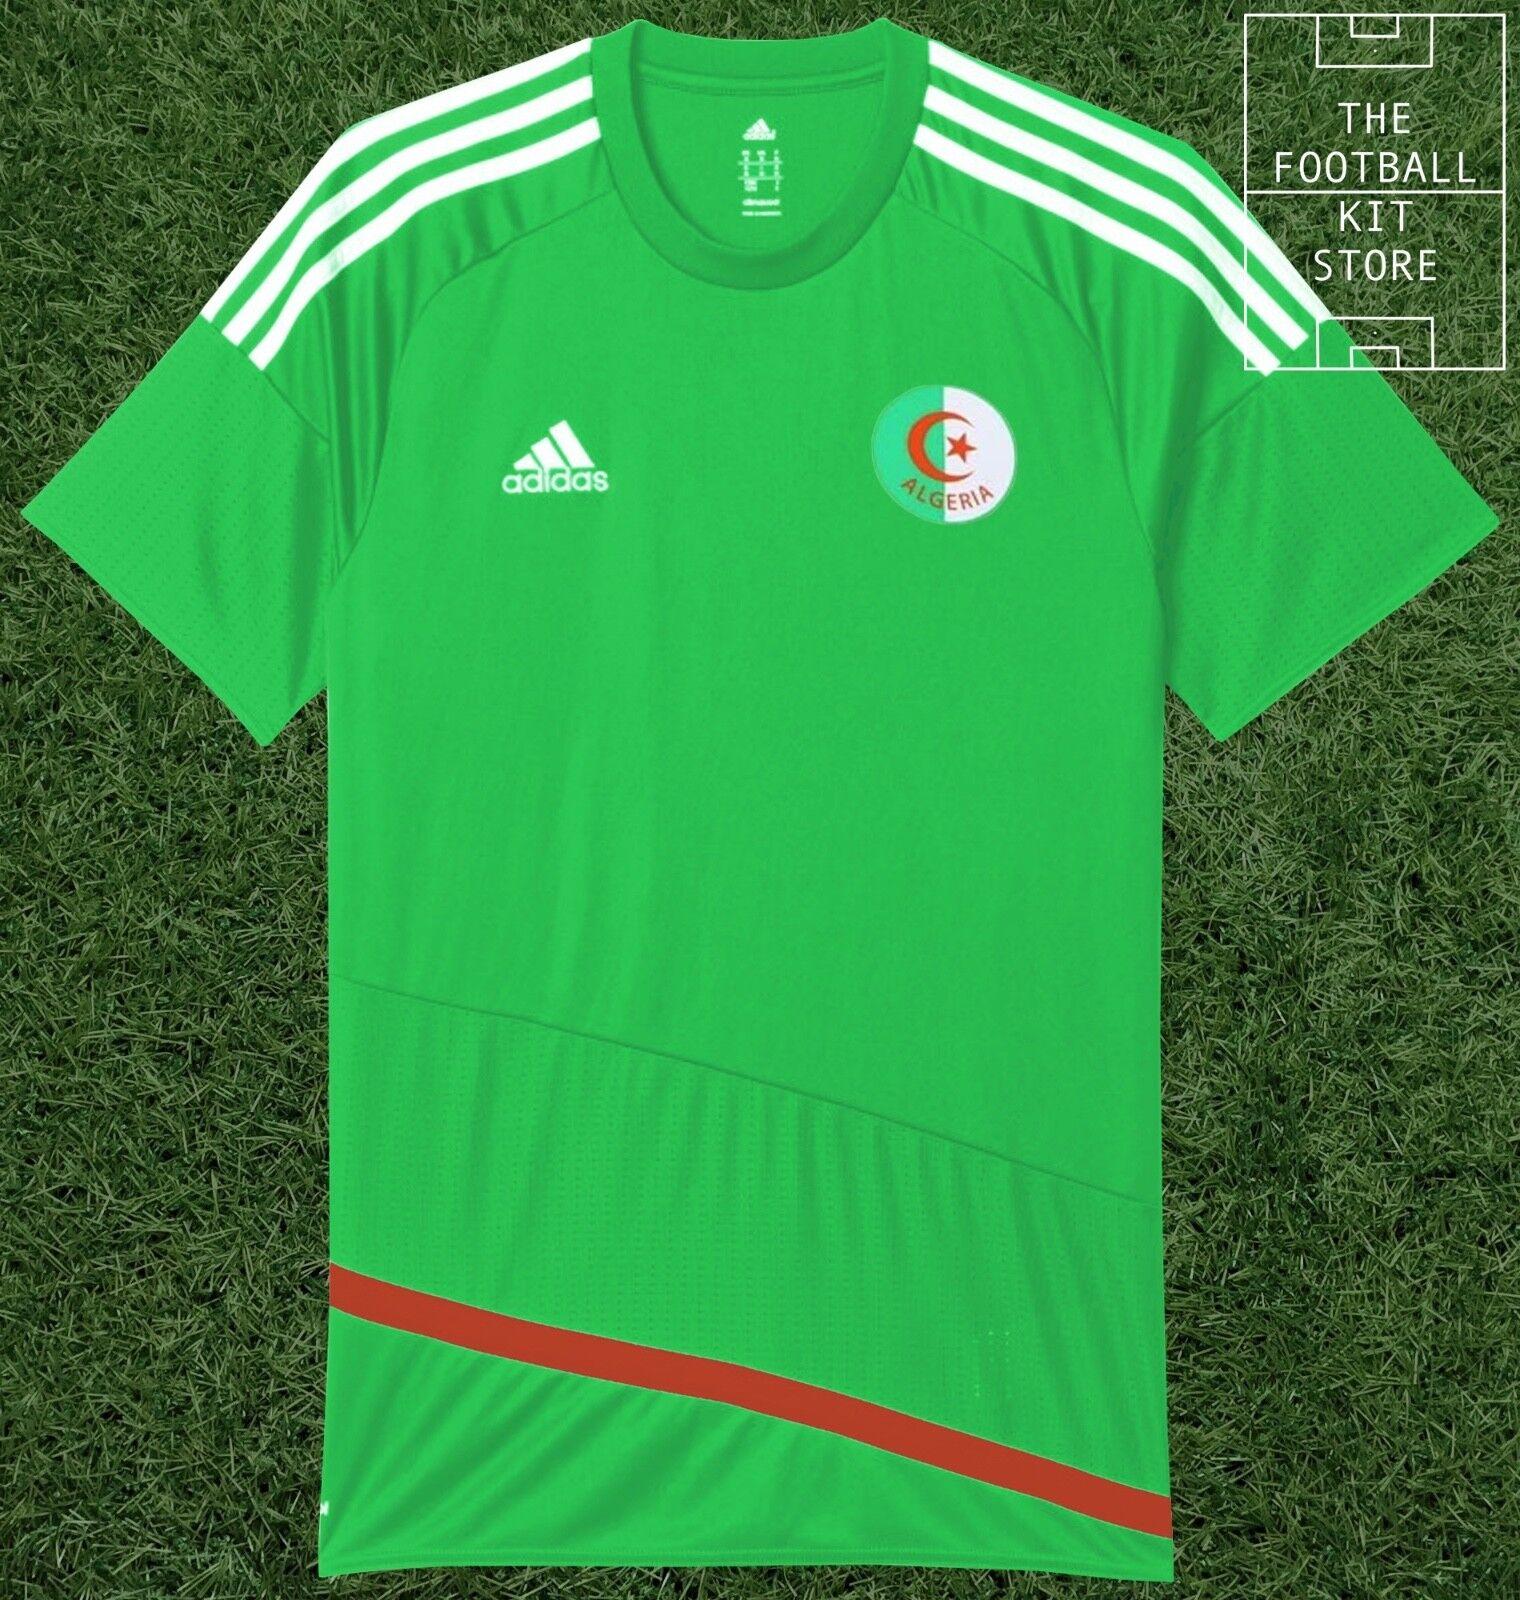 Algeria Away Shirt - Official adidas Football Jersey - Mens - All Sizes